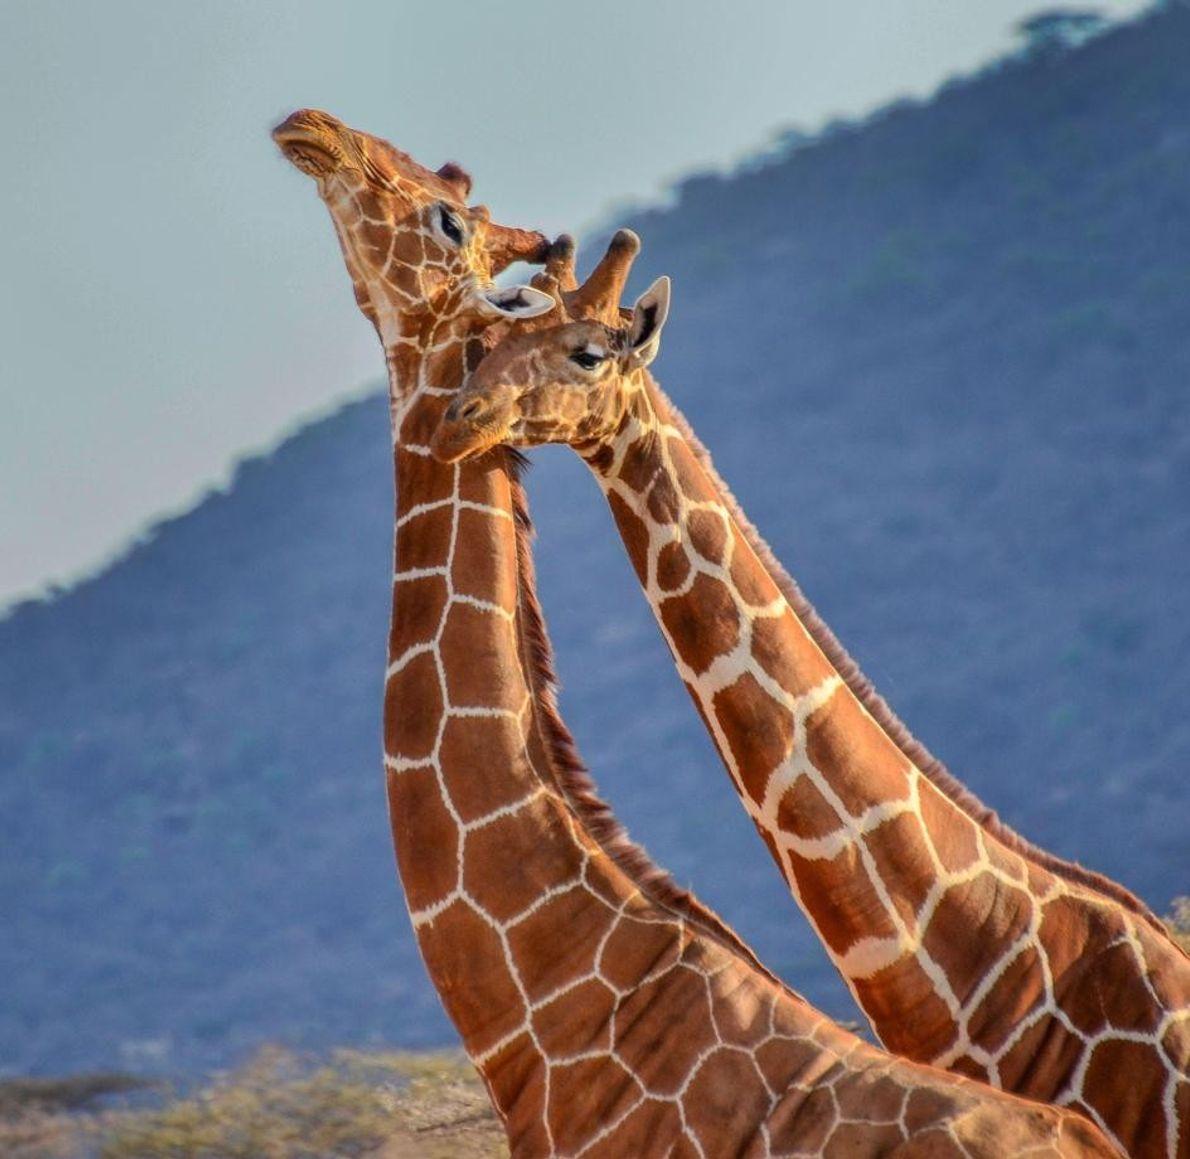 Deux girafes, réserve nationale du Masai Mara, Kenya.